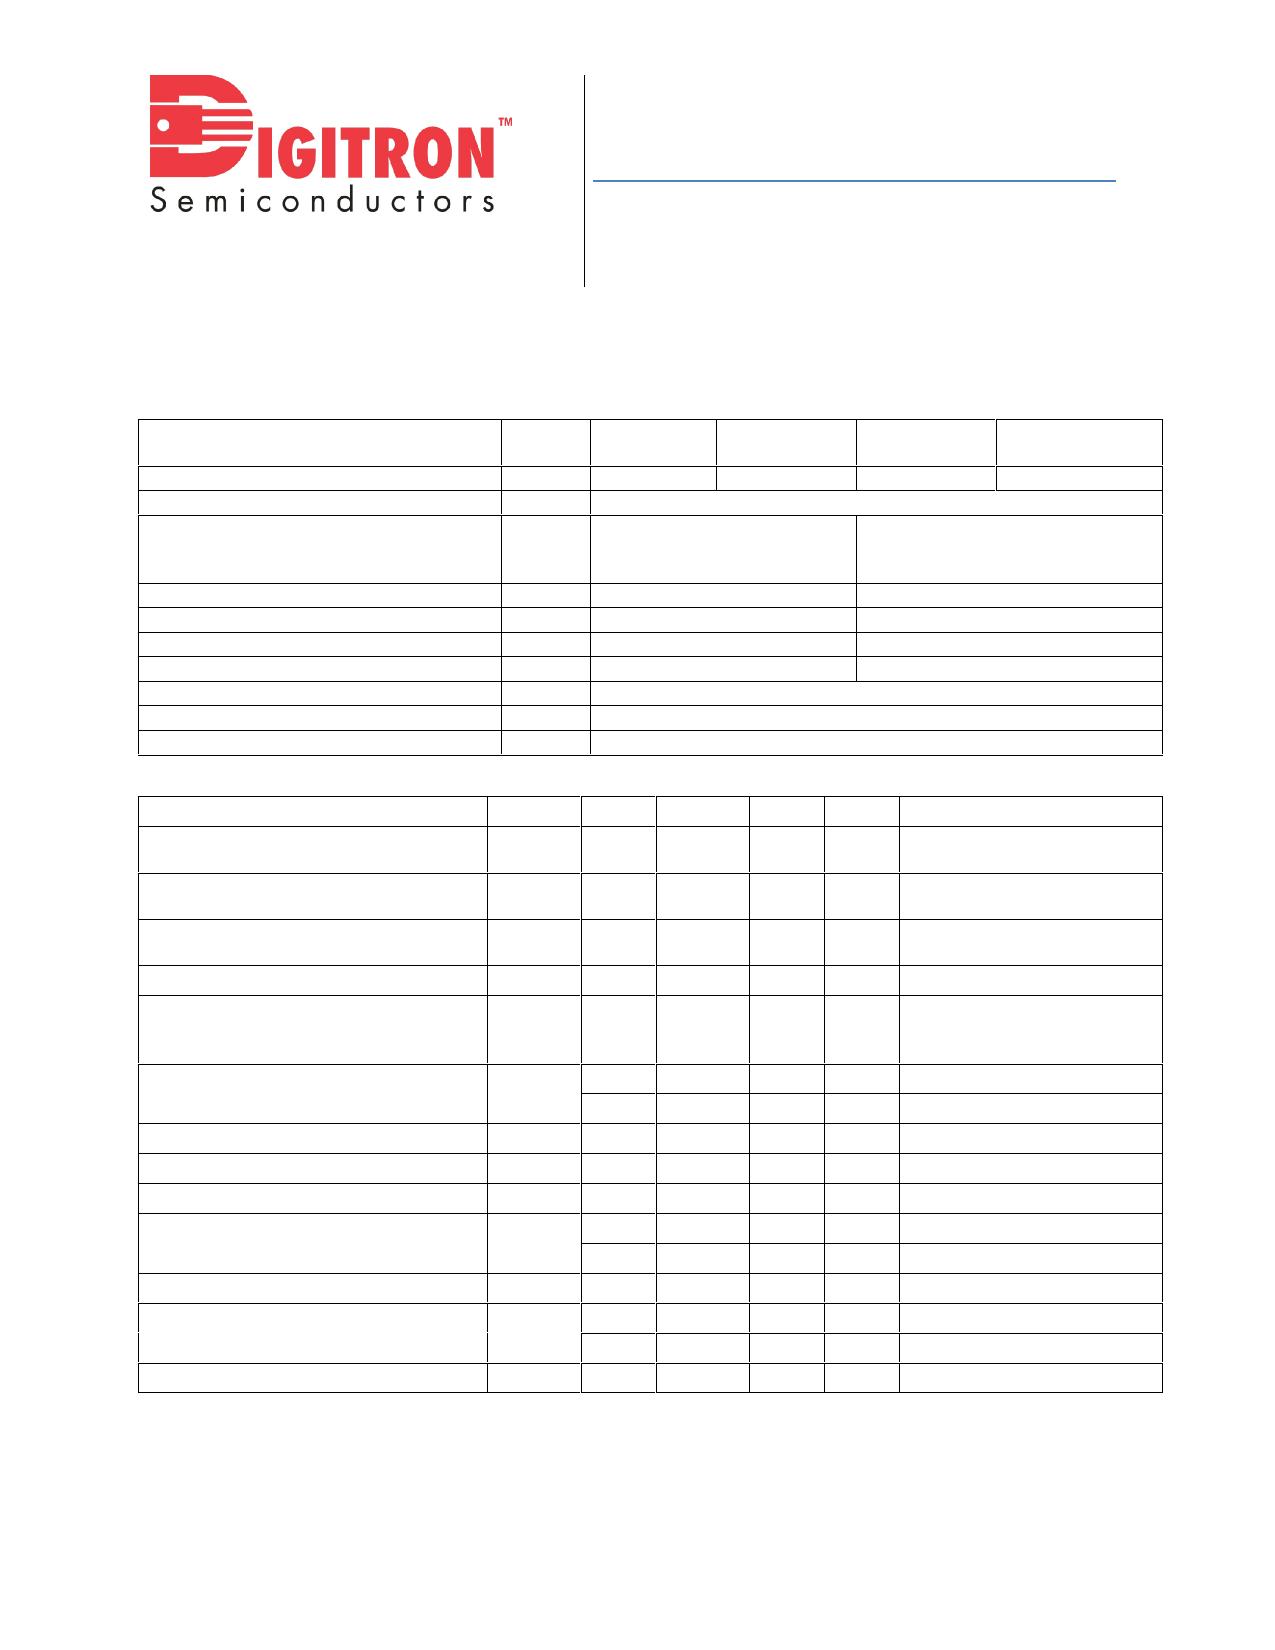 GA201 datasheet